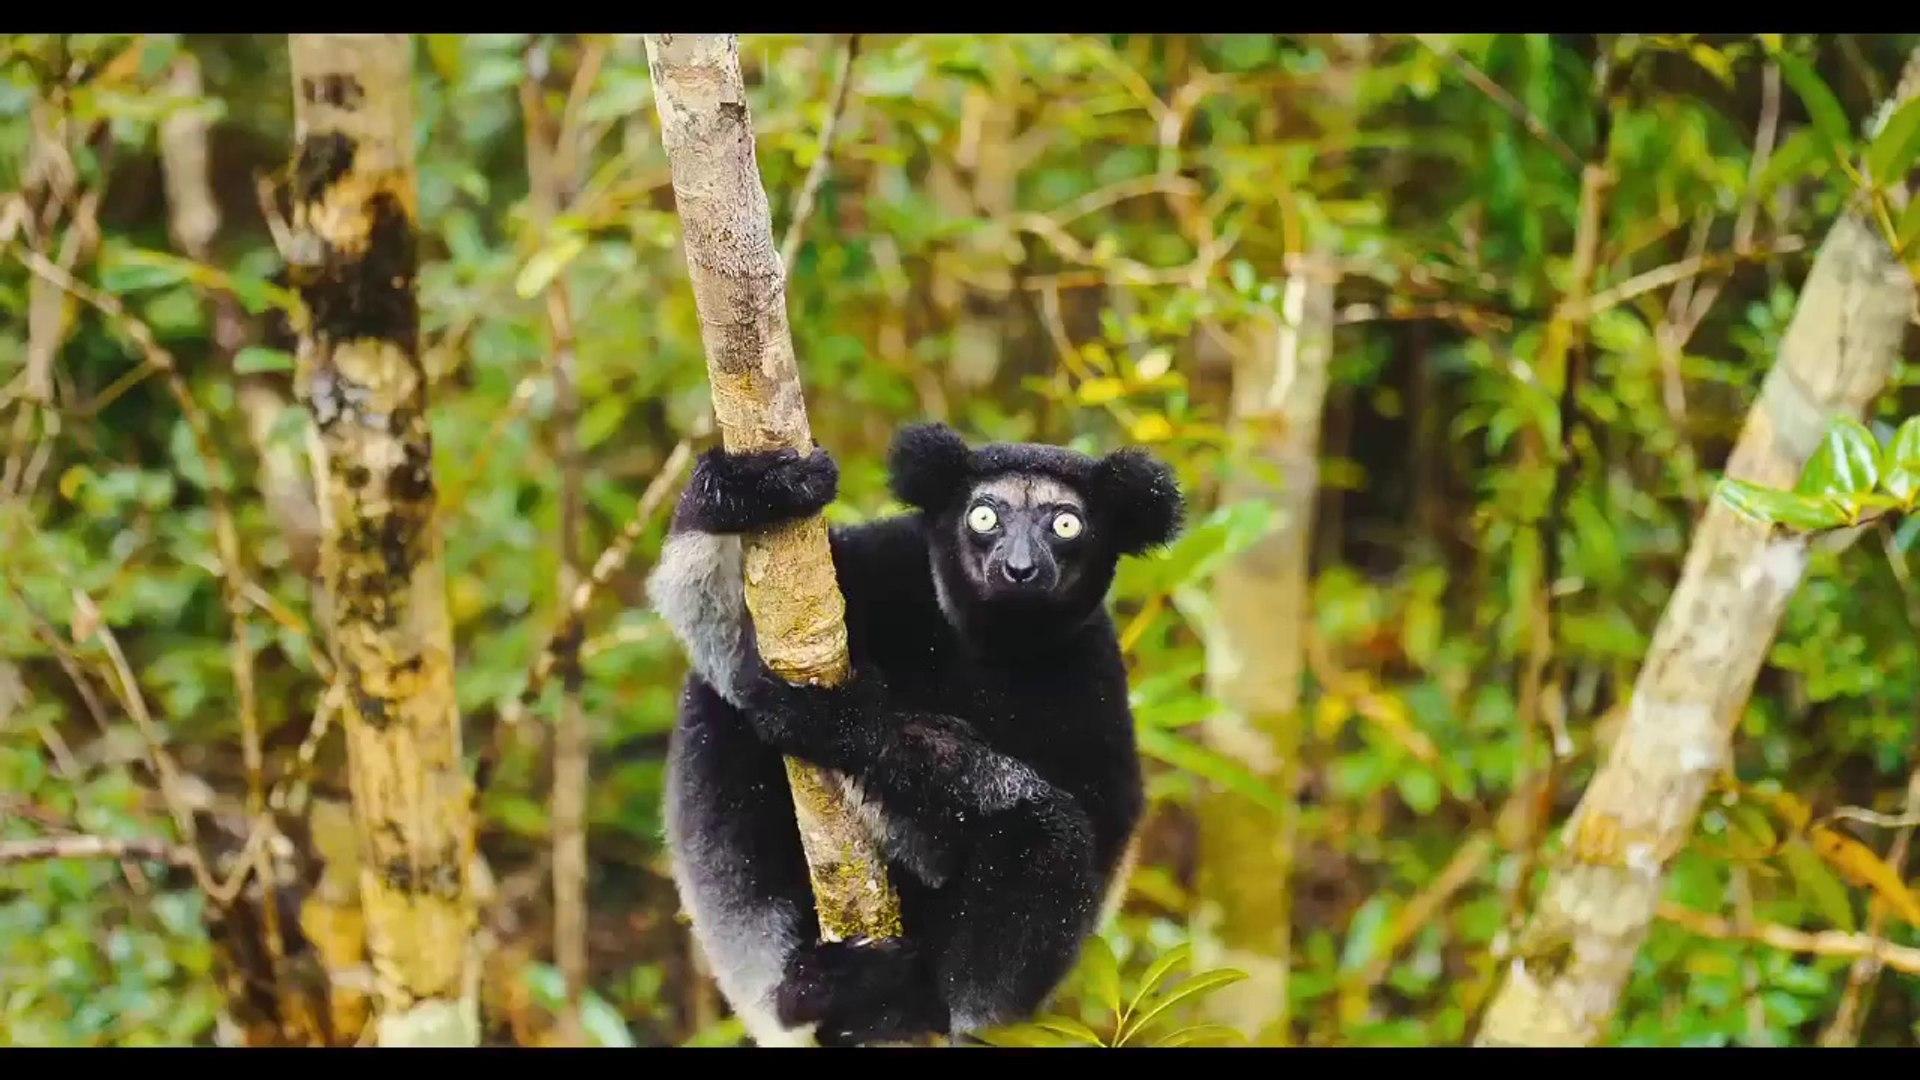 Island of Lemurs  Madagascar TV SPOT 1 (2014) - Nature Documentary HDIsland of Lemurs  Madagascar TV